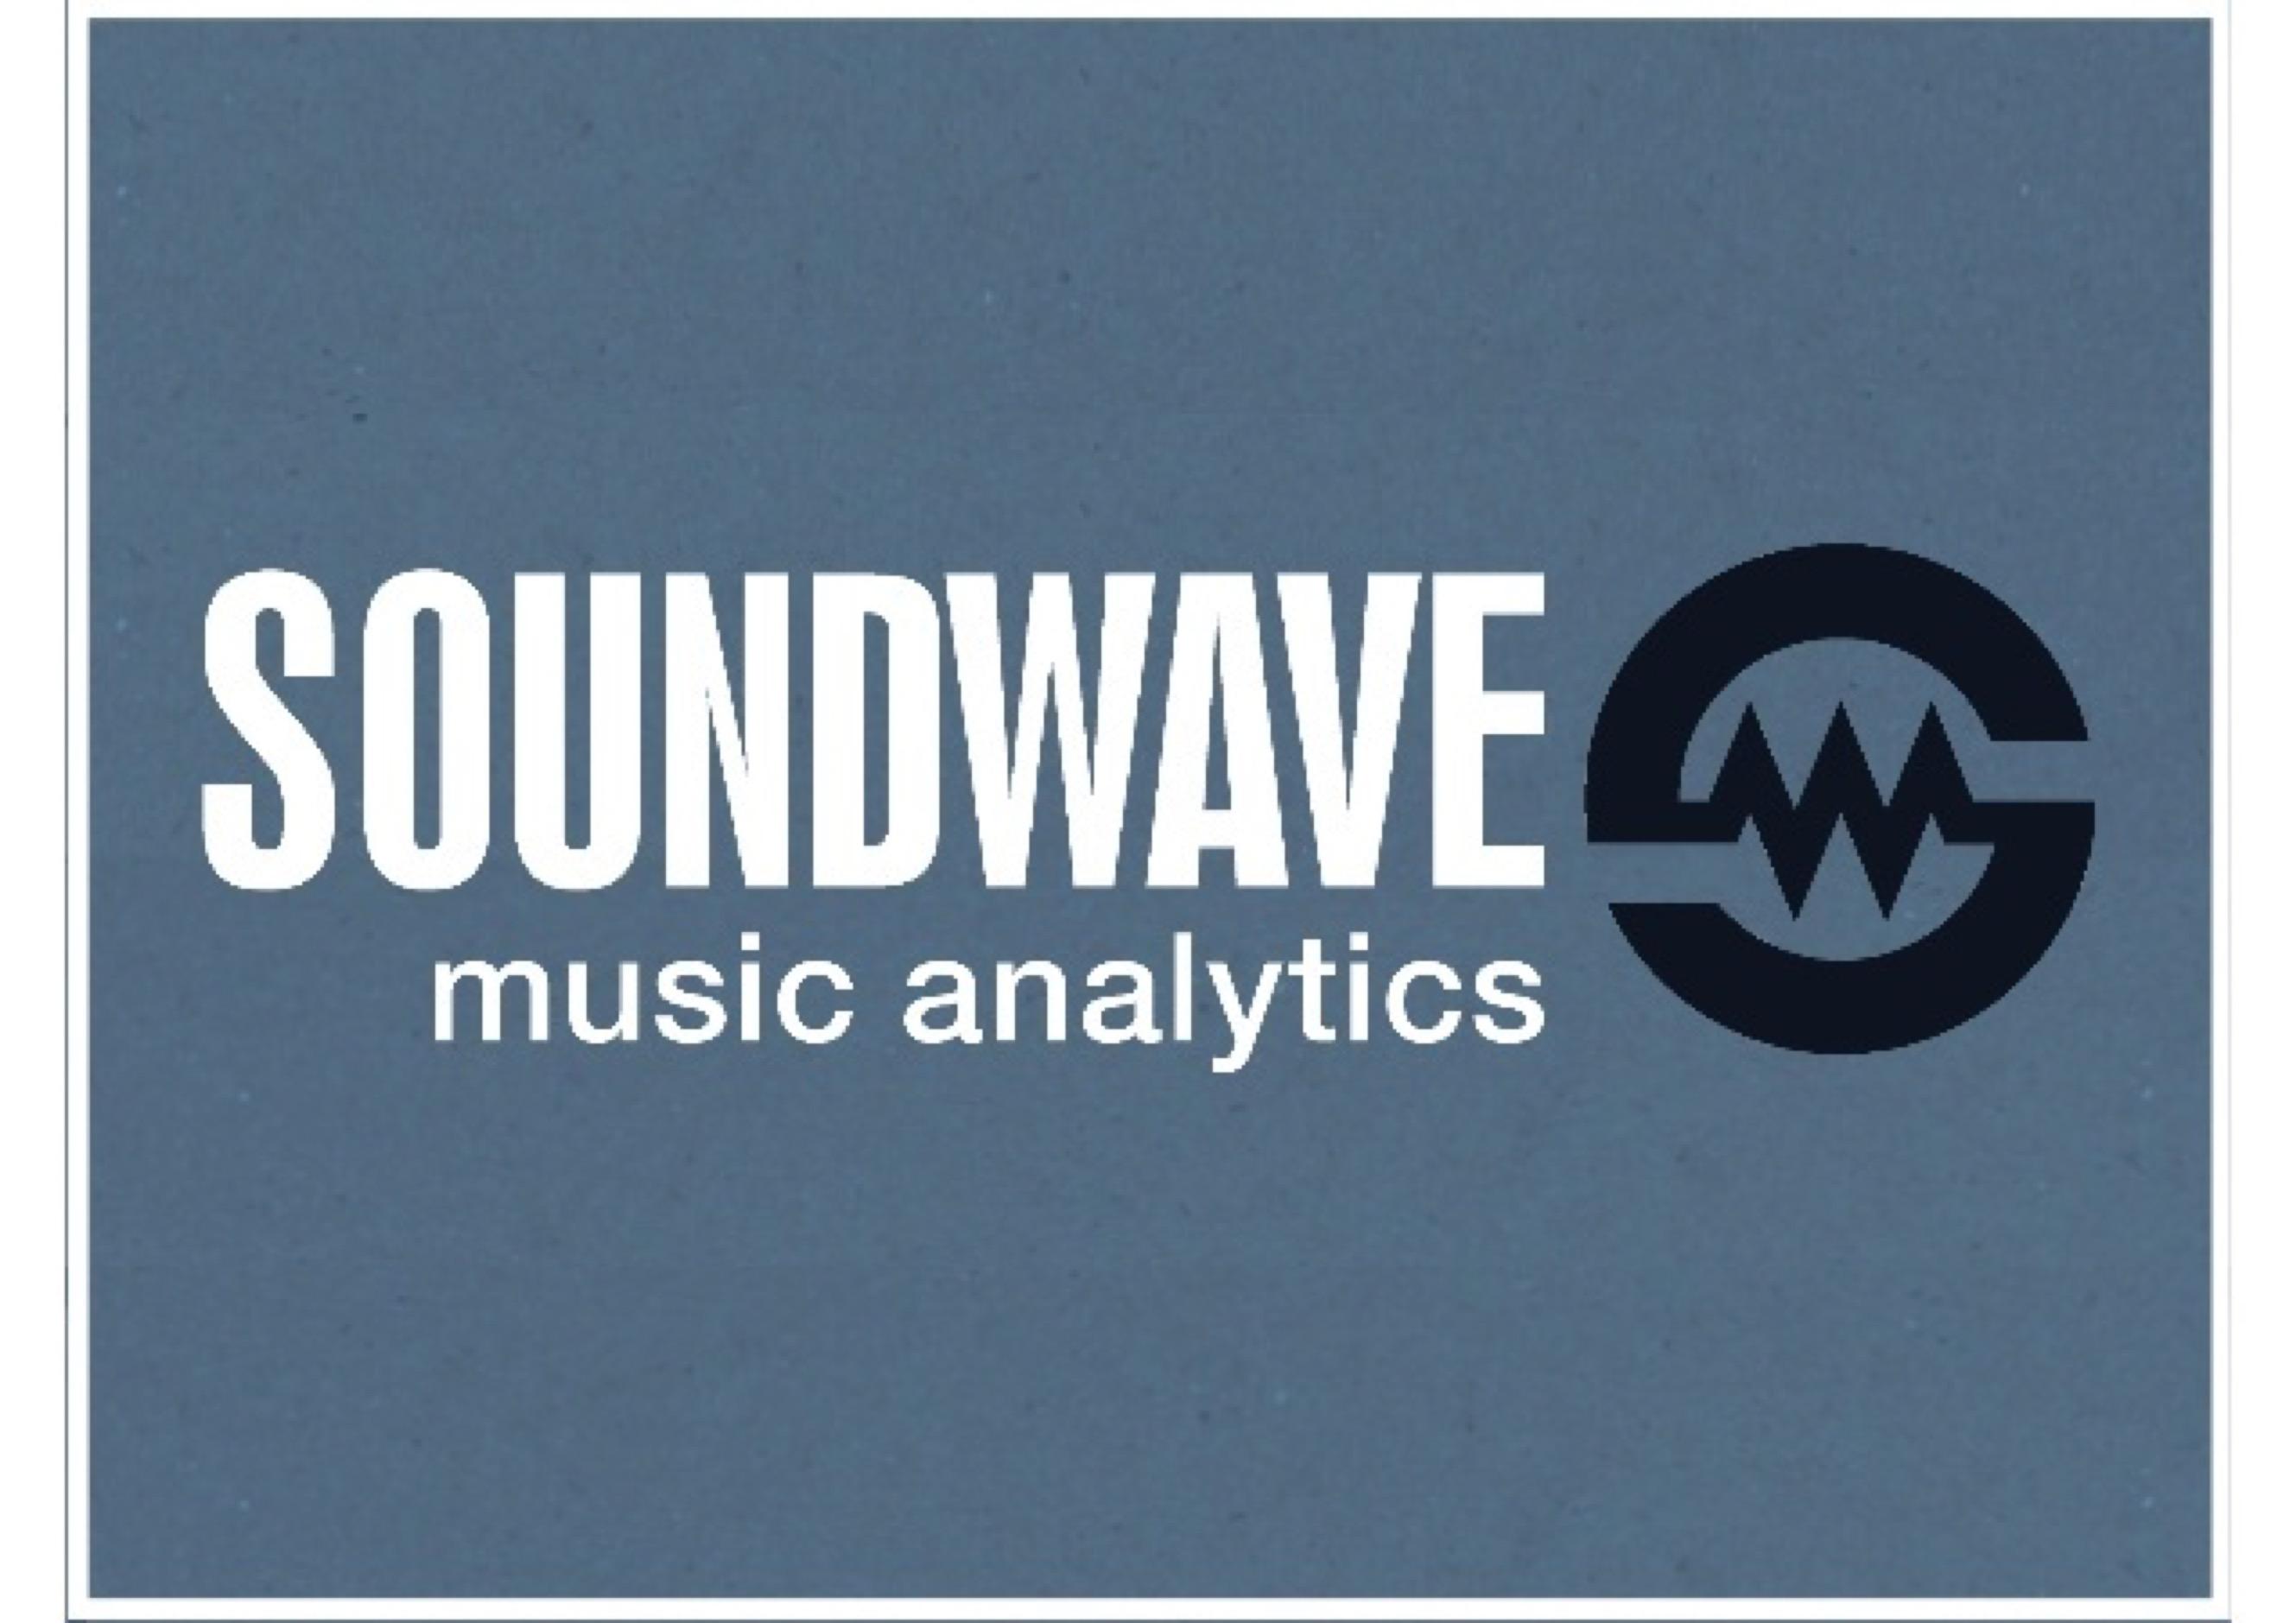 soundwave-pitchdeck-001